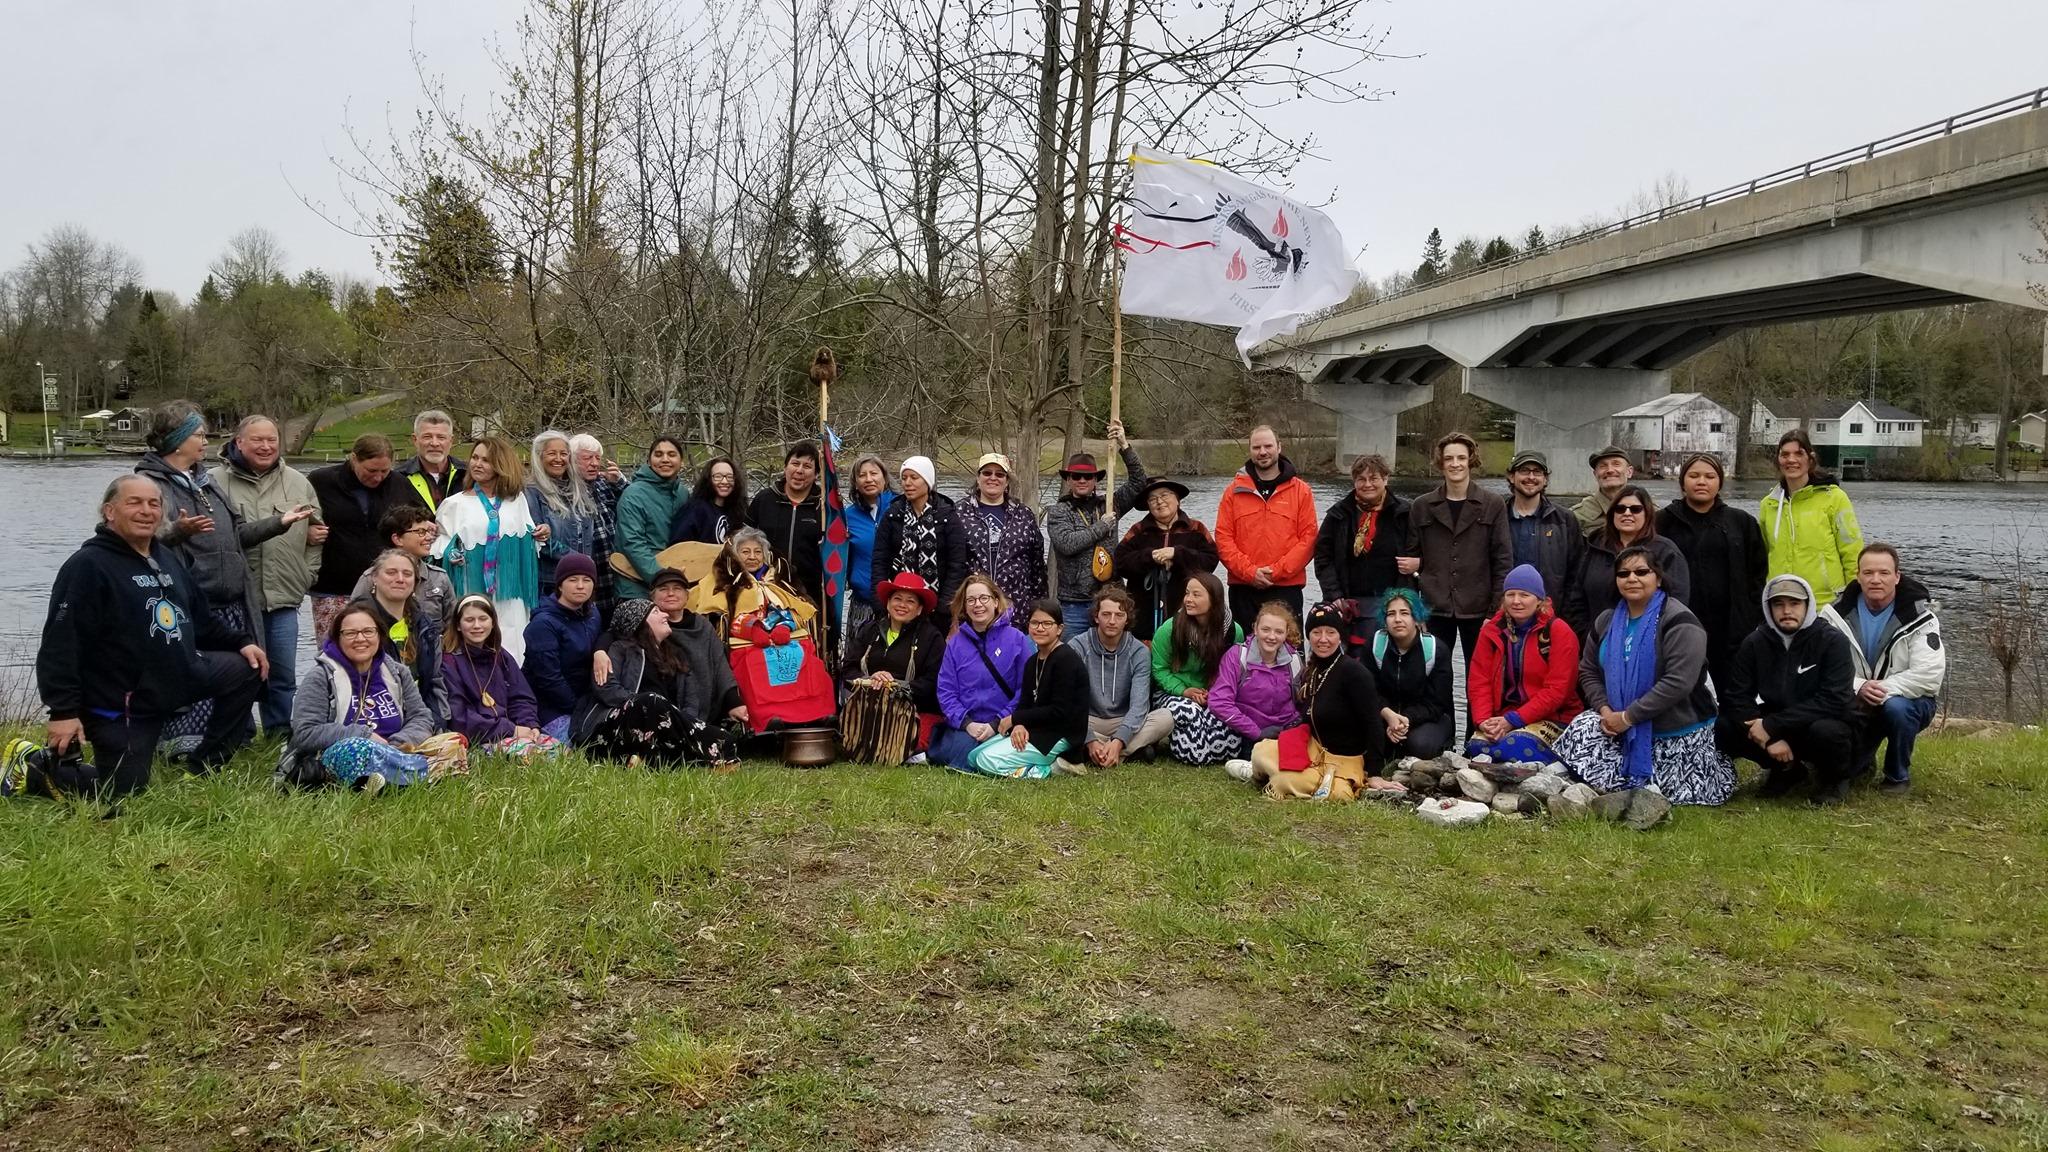 2019 10th Annual Water Walk